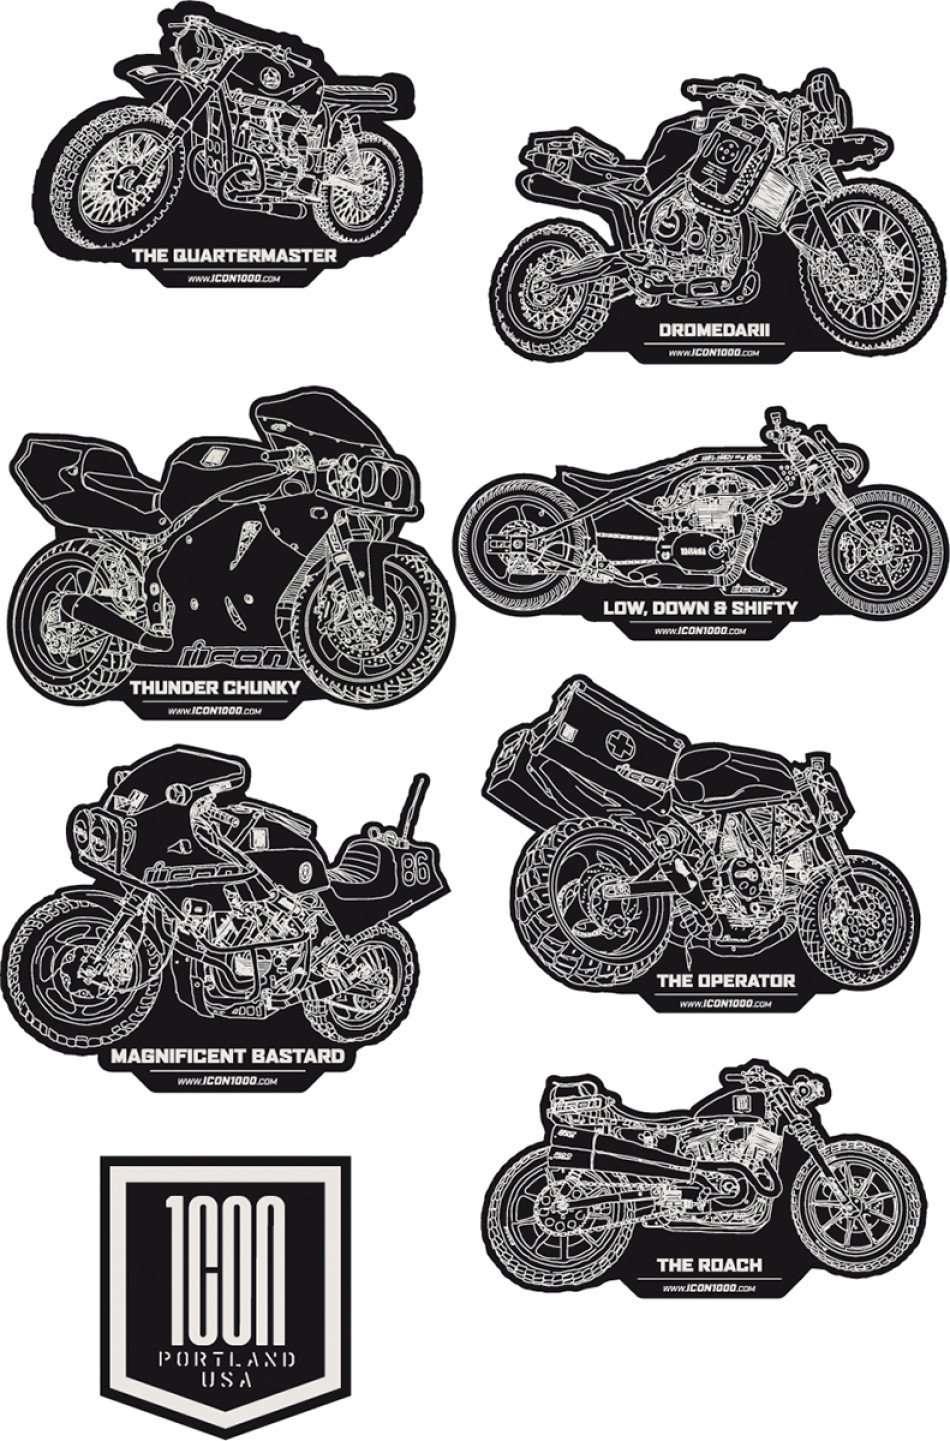 россии фото наклеек животных на мотоцикл ночи